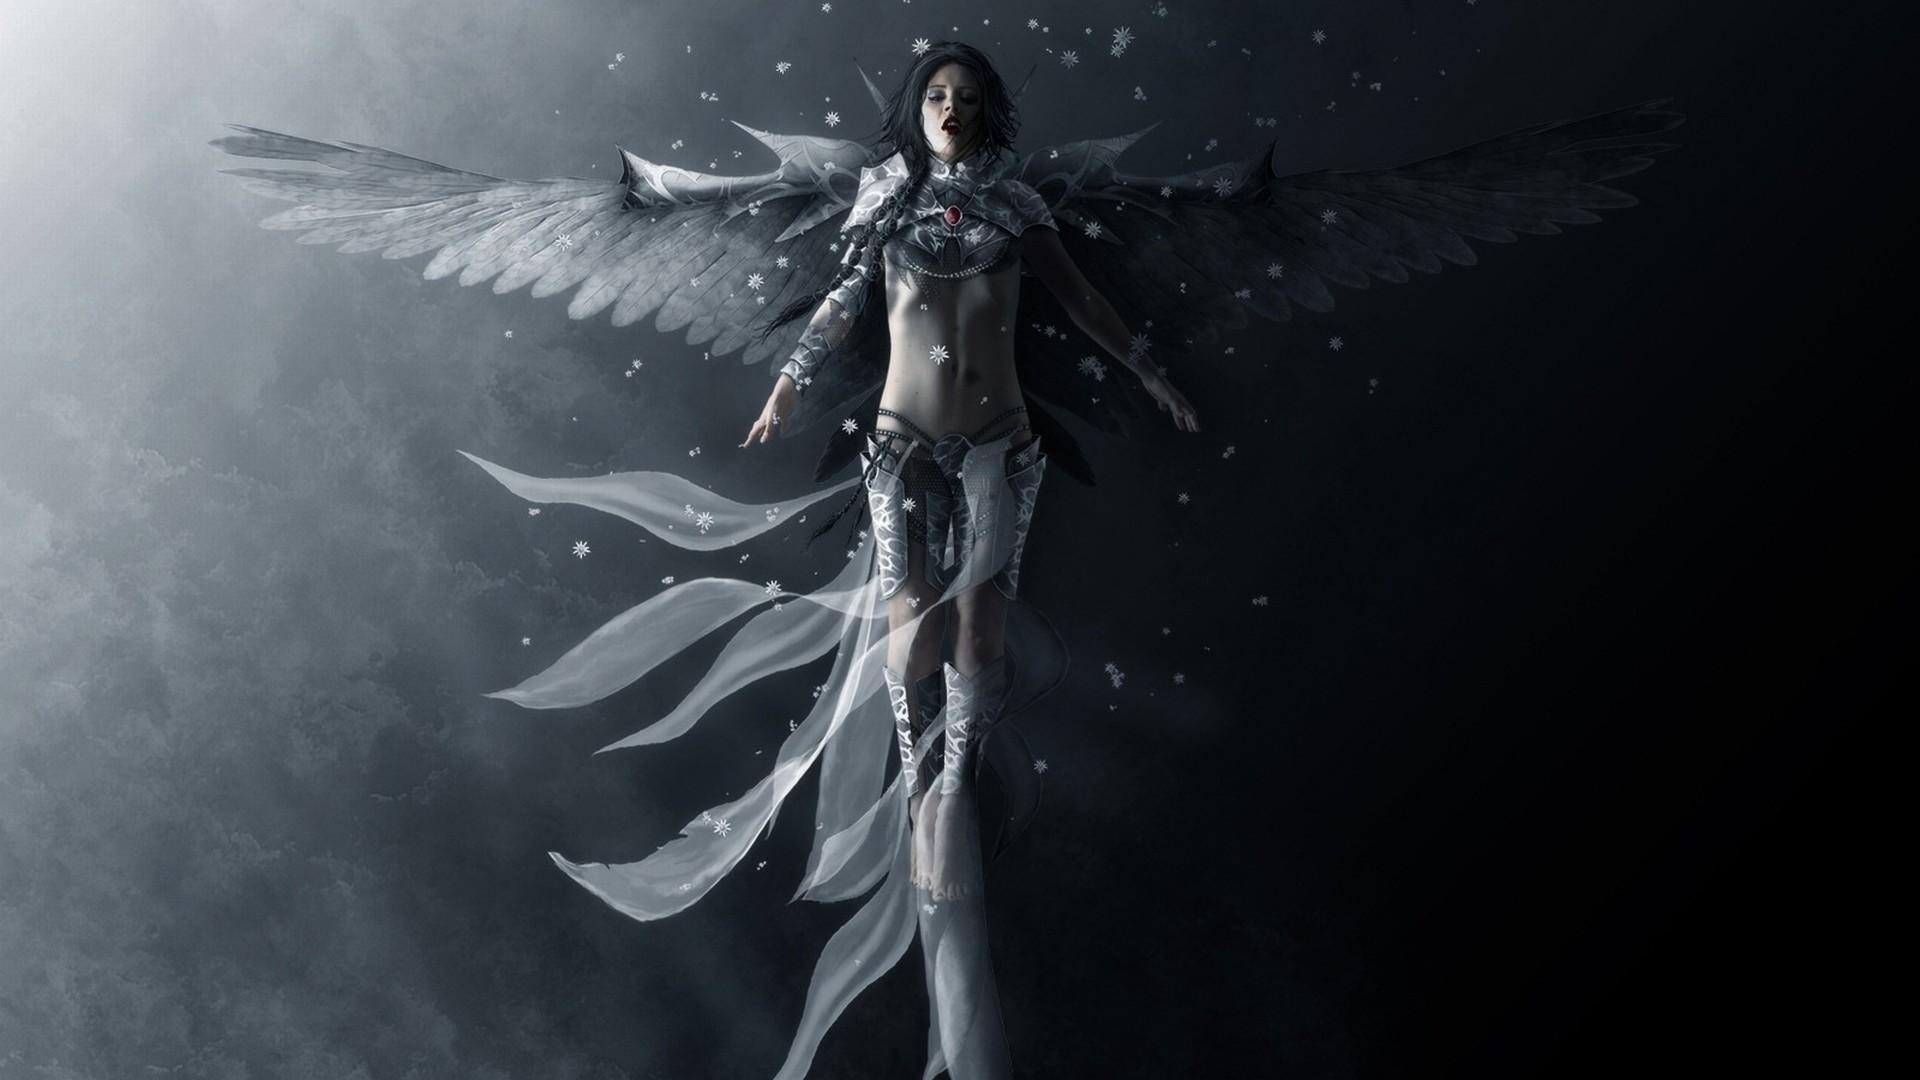 Fallen Angel HD Wallpaper (70+ images)